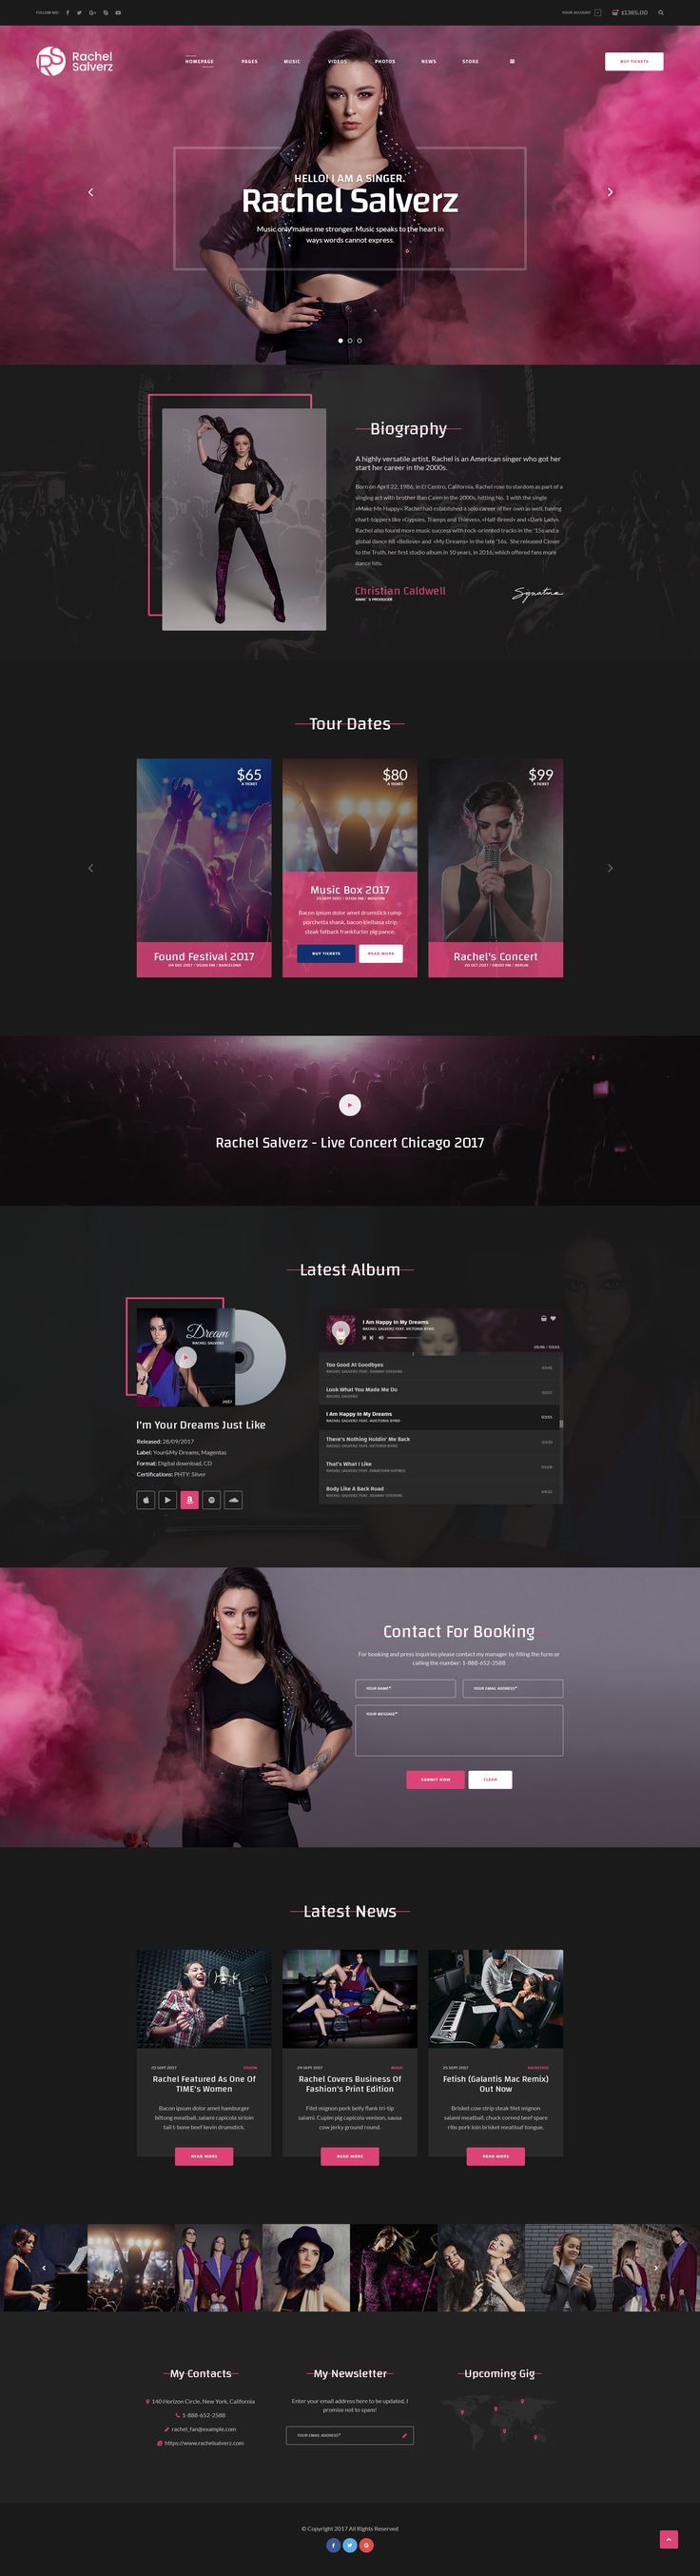 Singer - Music Singer PSD Template #music band #musical #musician • Download ➝ https://themeforest.net/item/singer-music-singer-psd-template/20760710?ref=pxcr